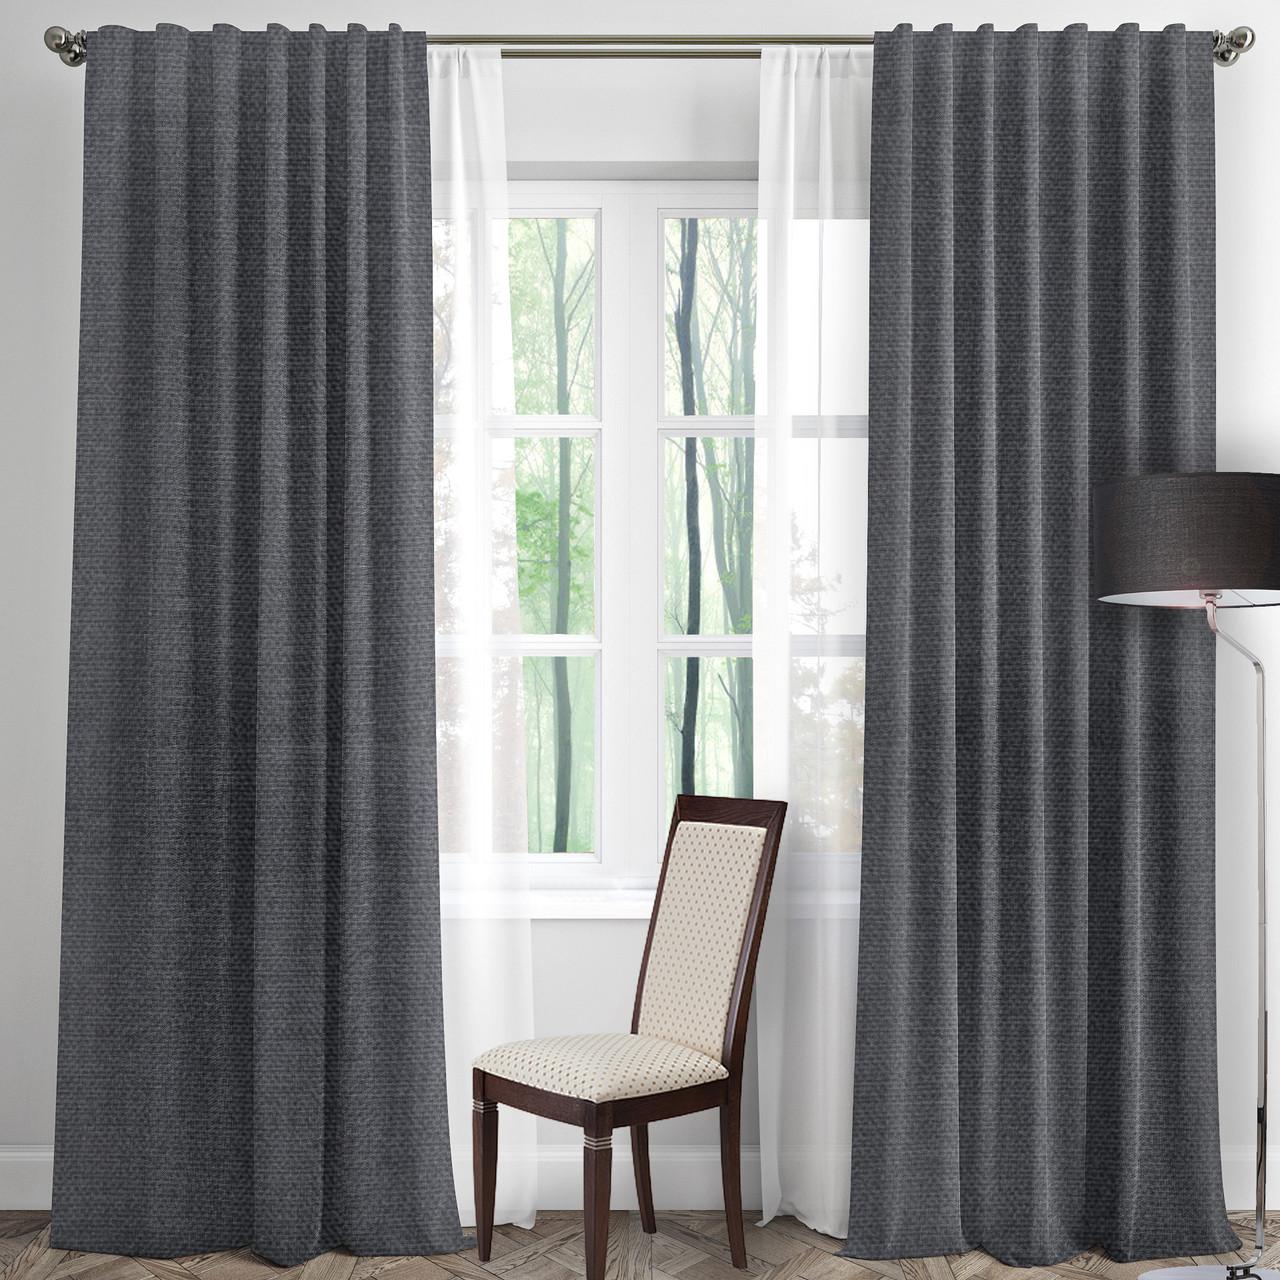 Готовые шторы RIGI-39 цвет темно-серый